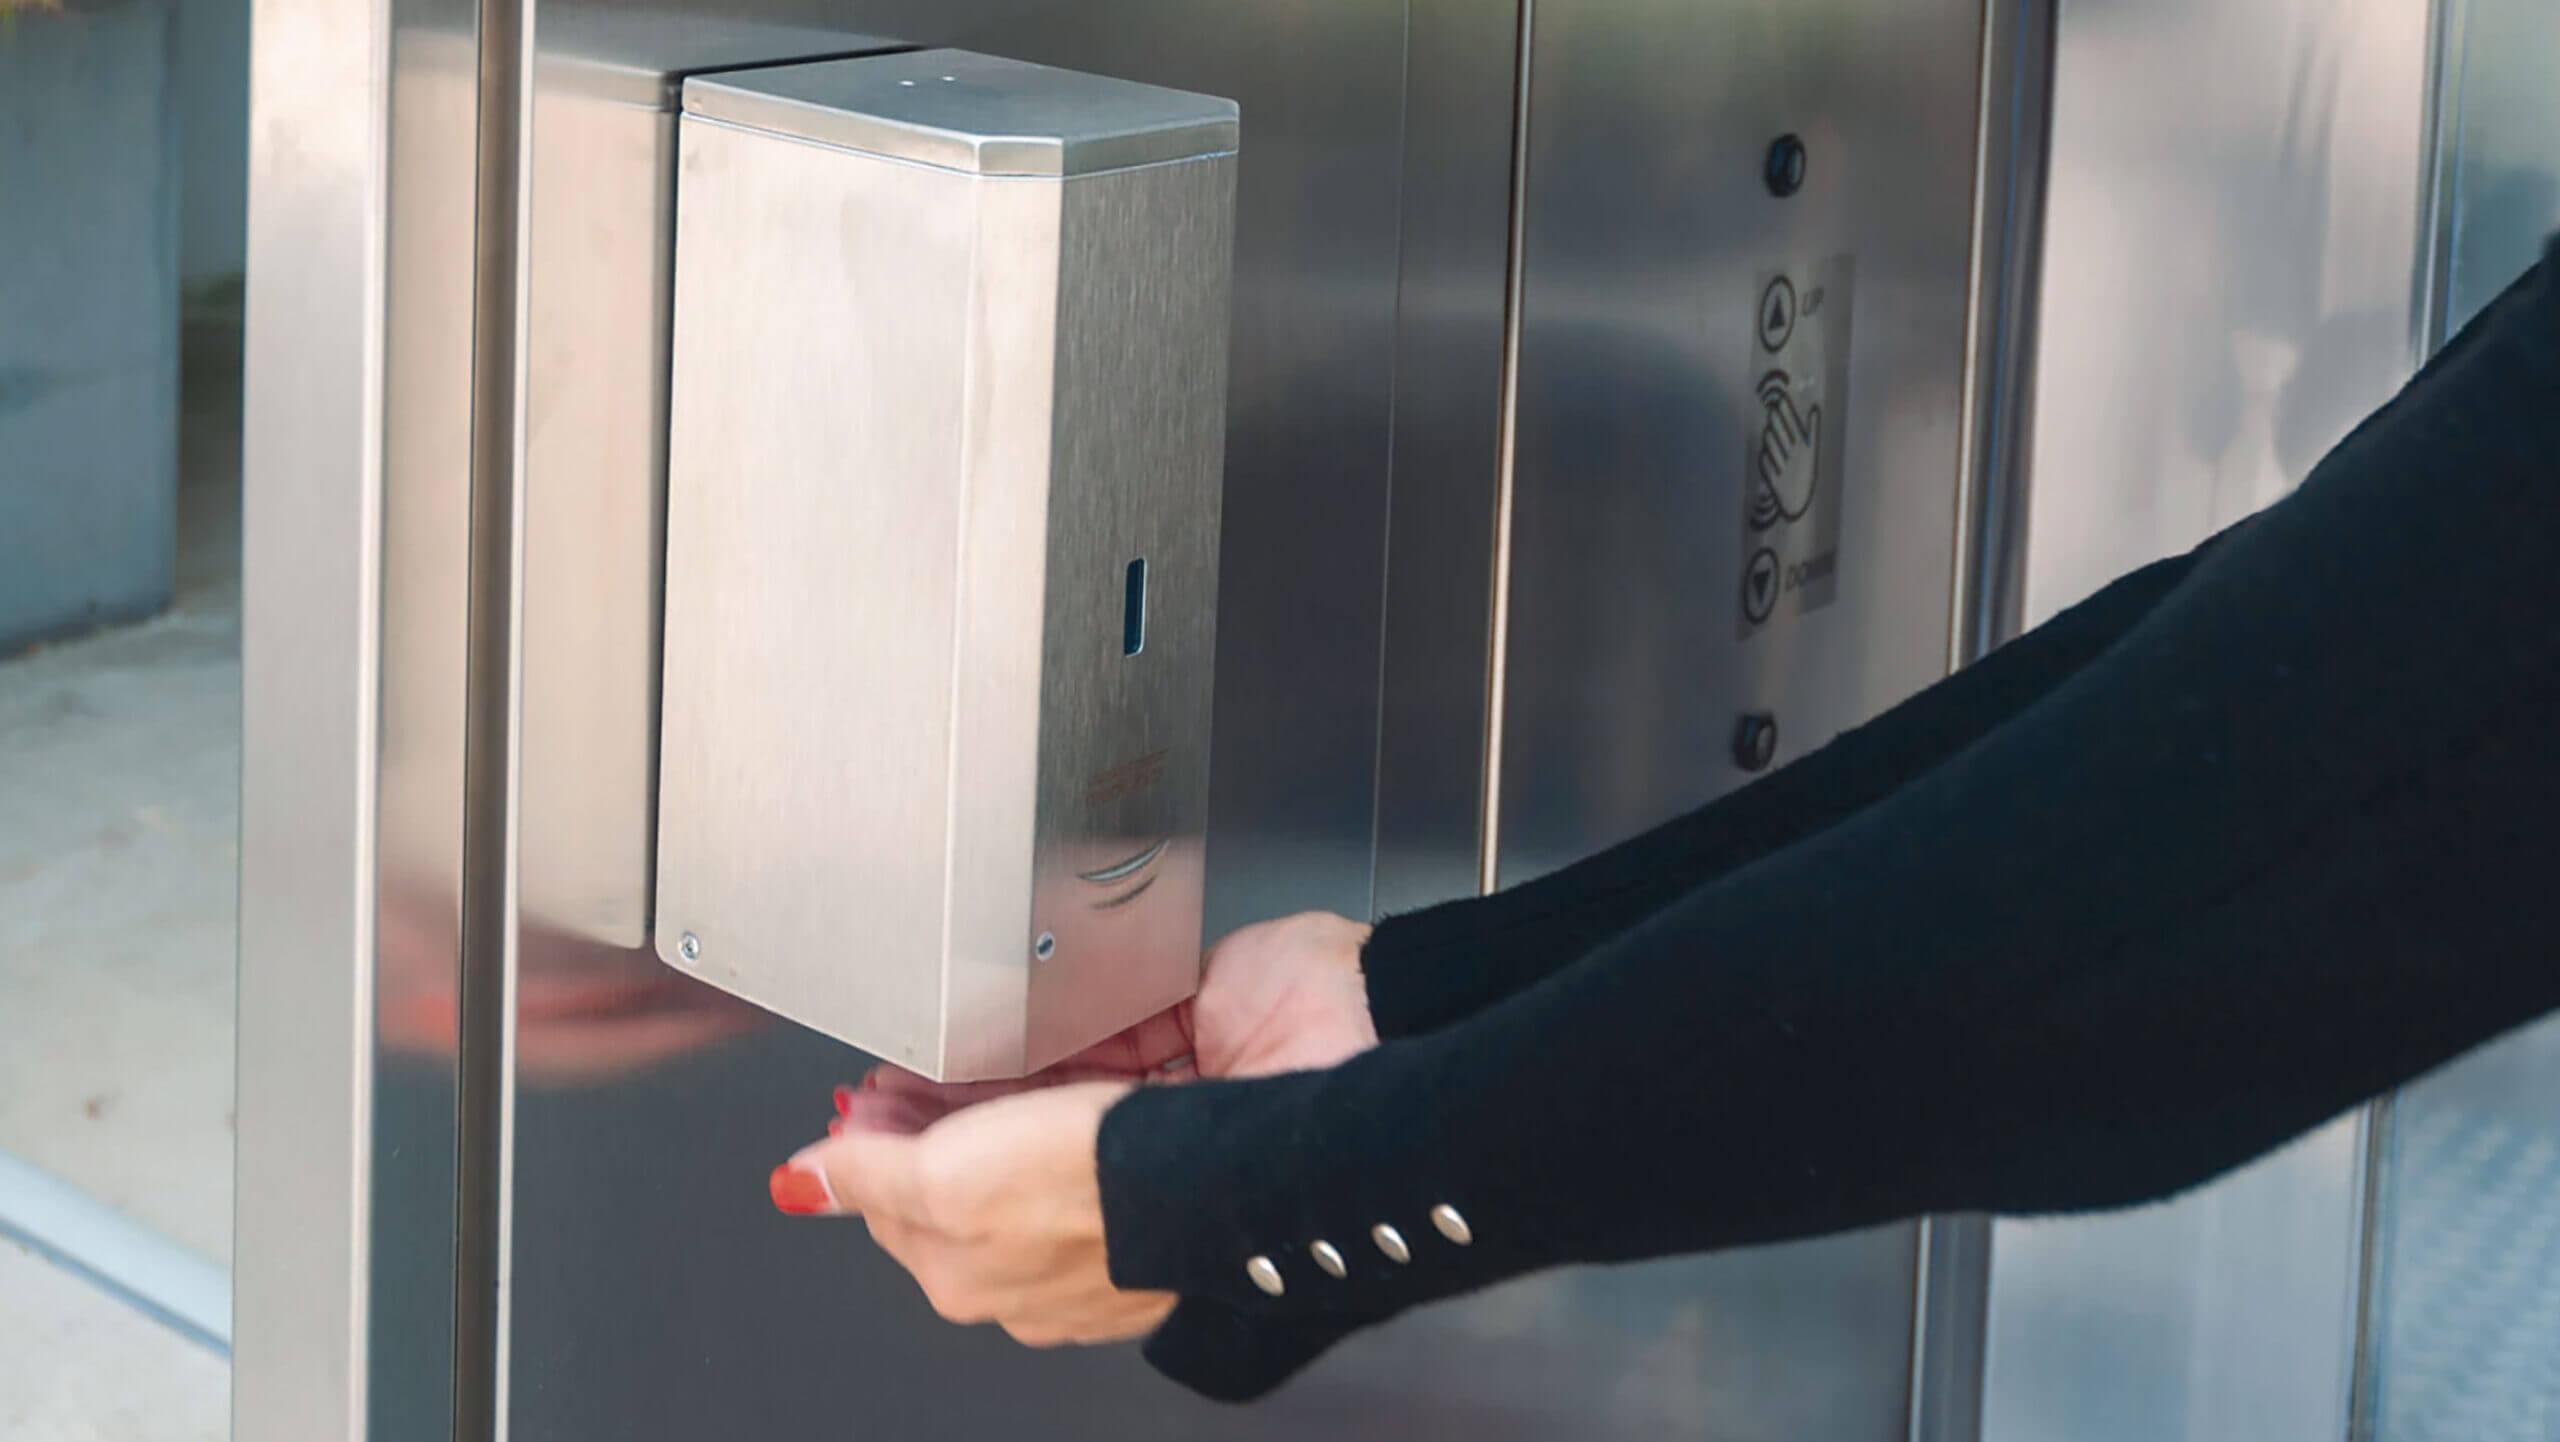 sensors-detection-disinfectant-atomization-nebulization-sanitizing-cabin-sanapur-besafe-S2Life